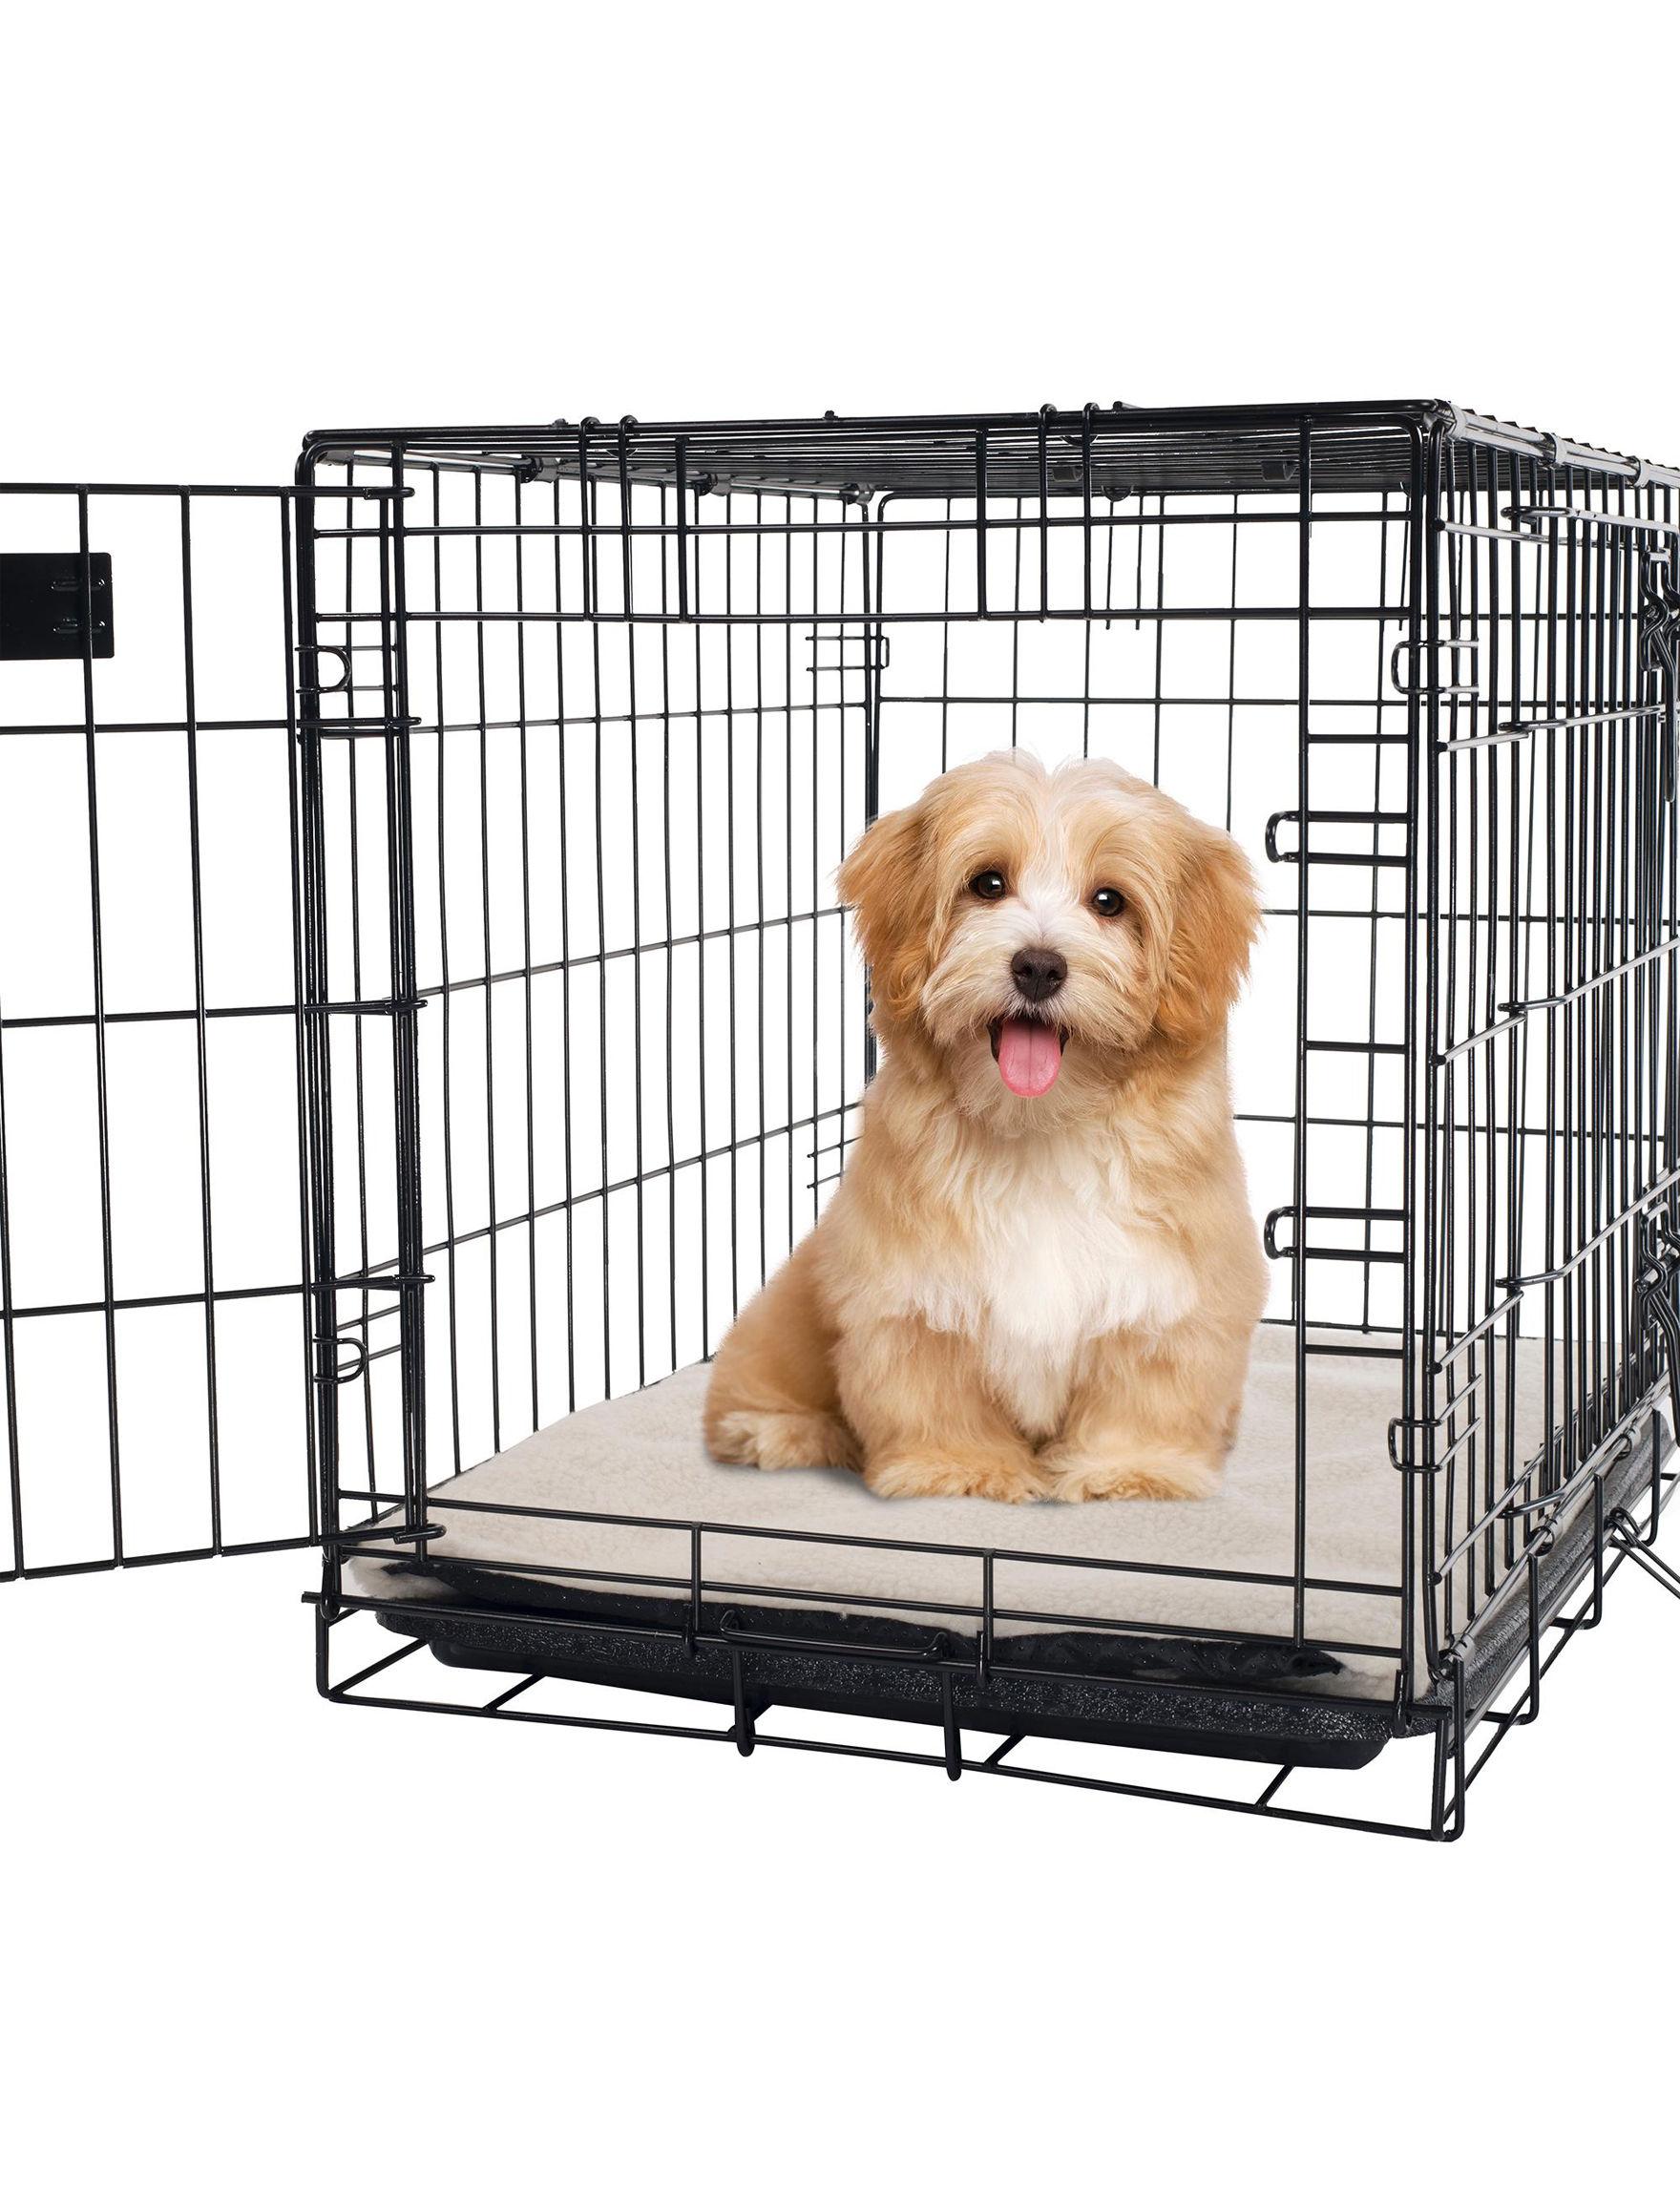 Petmaker Beige Pet Beds & Houses